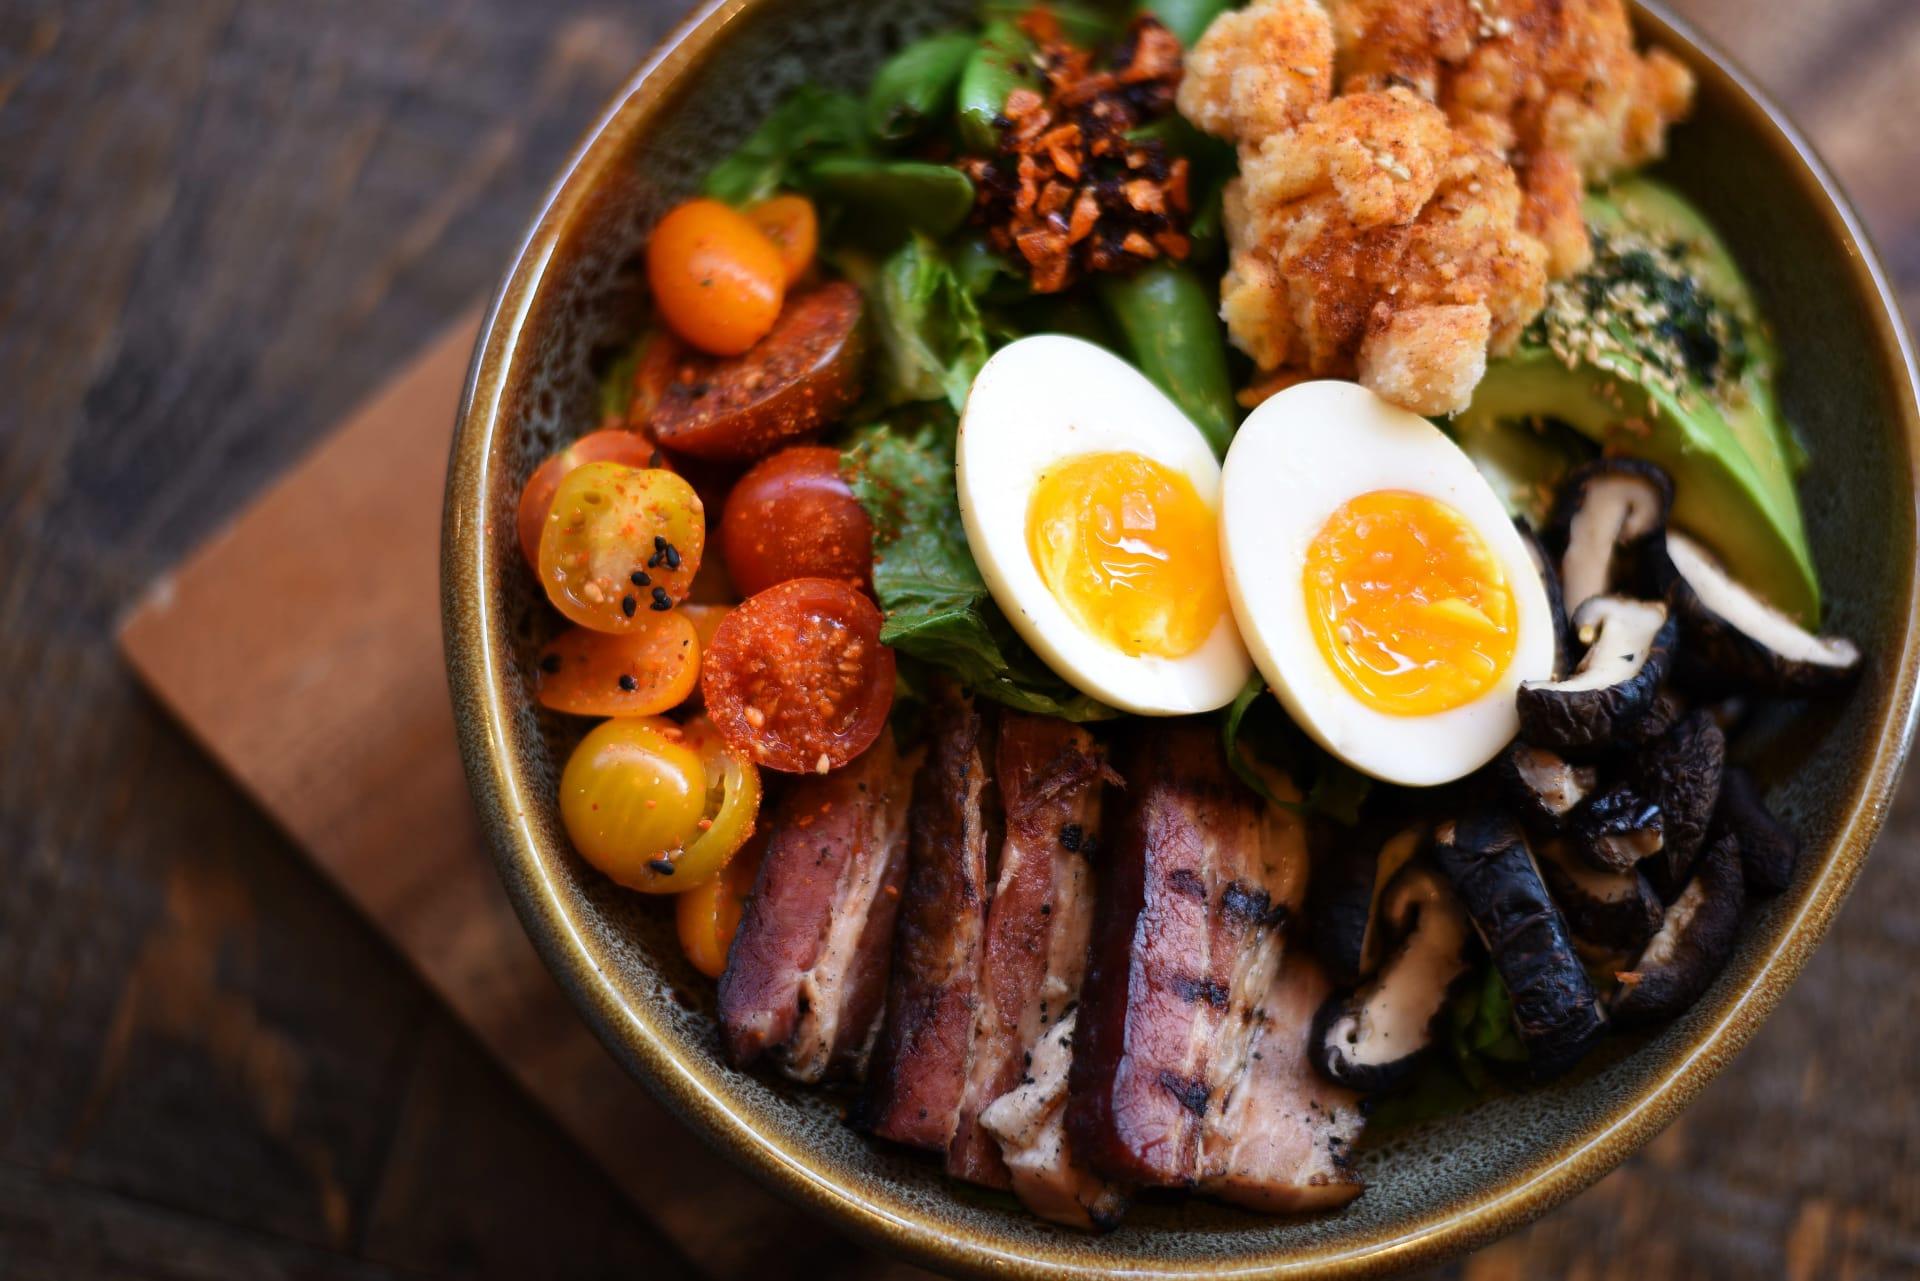 Miso Buttermilk Cobb Salad at SOCIAL